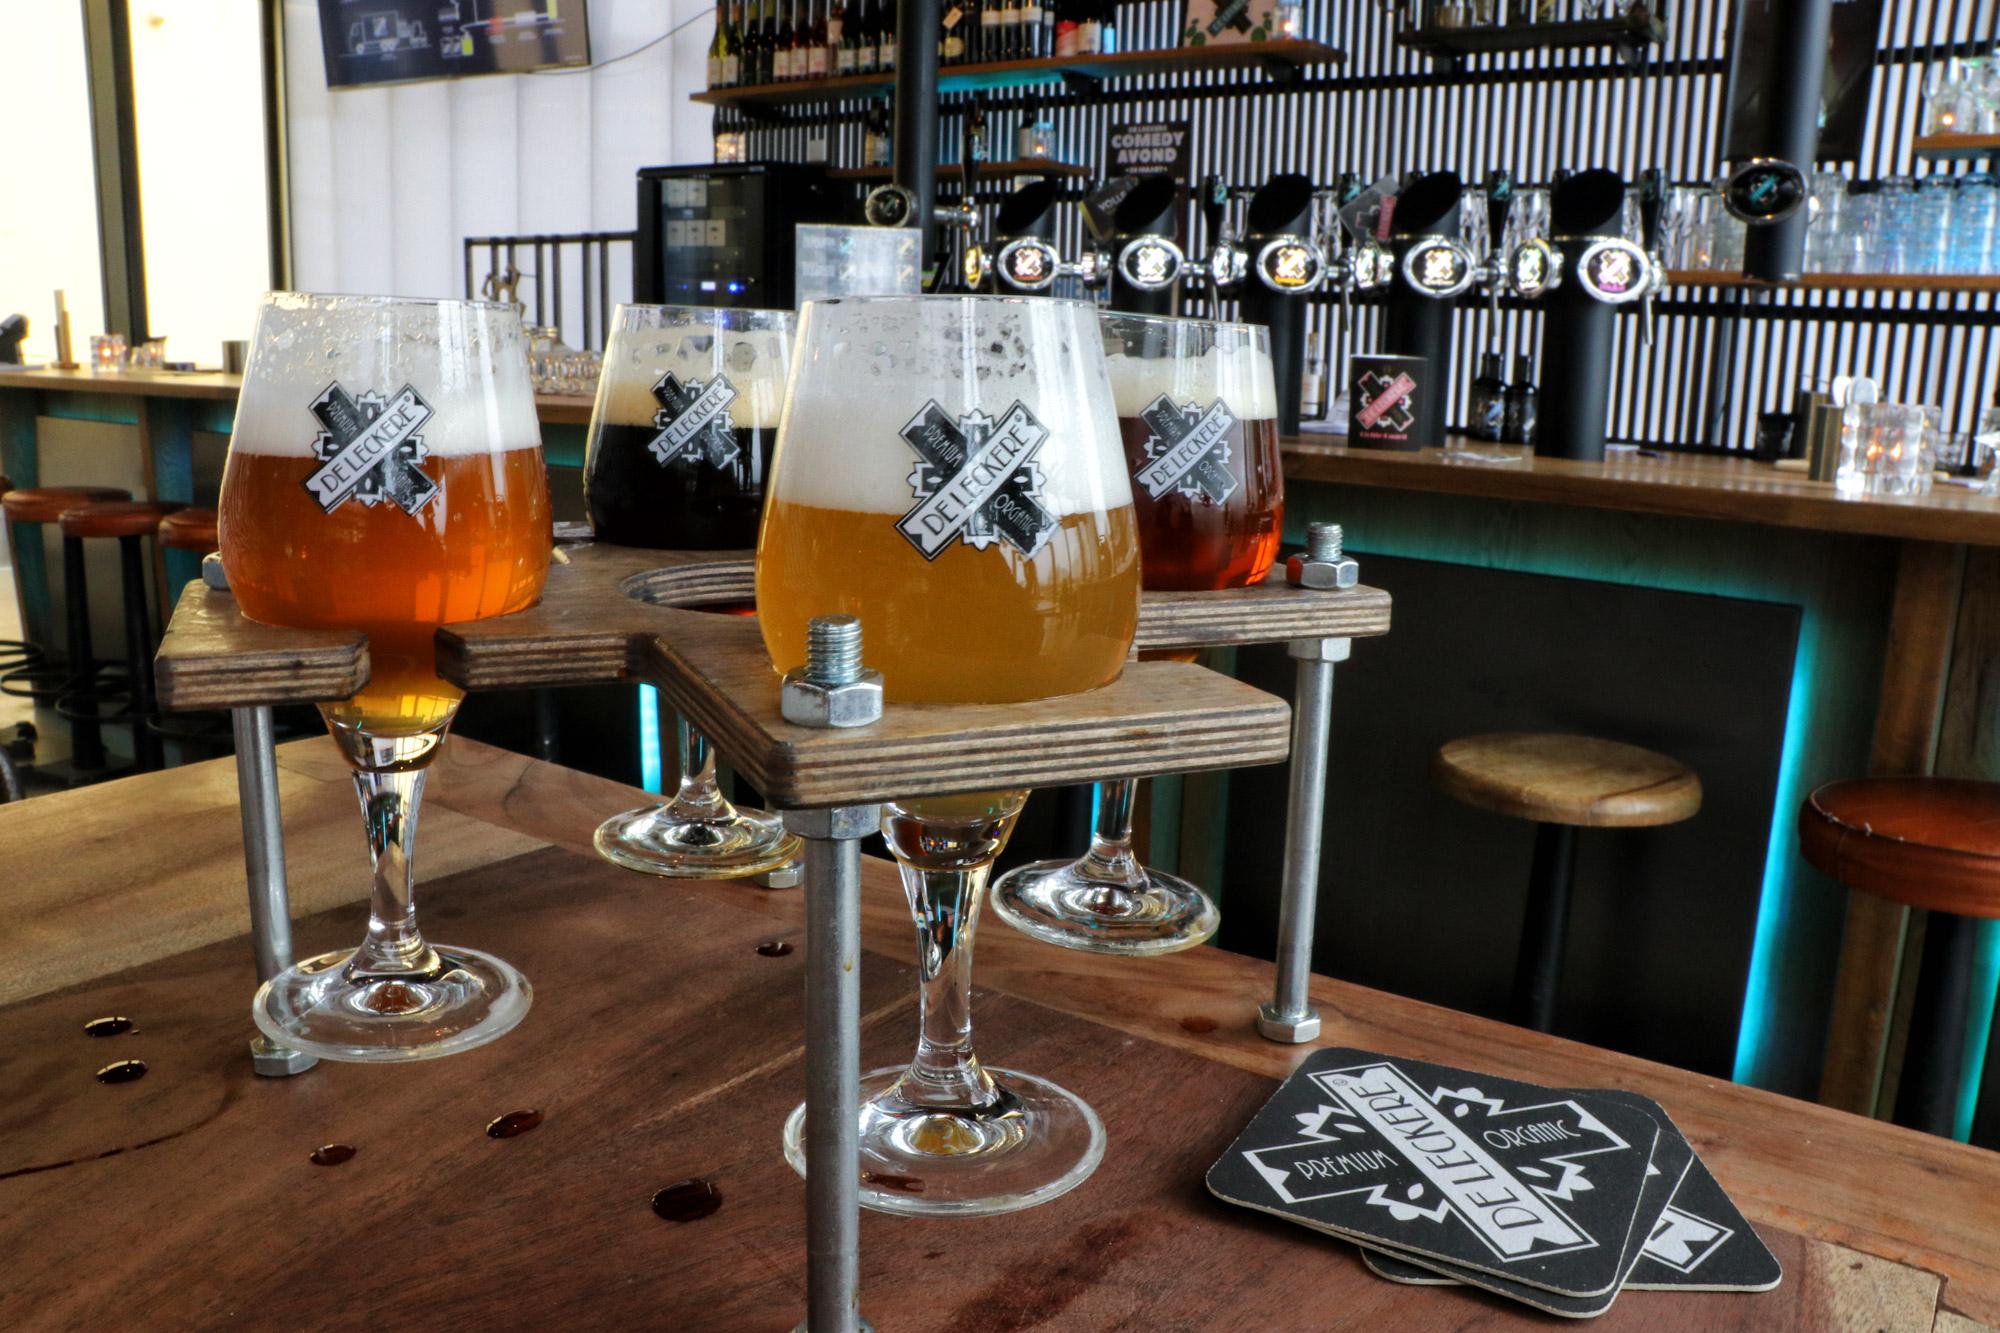 8 leuke biercafés in Utrecht - Werkspoorcafé De Leckere